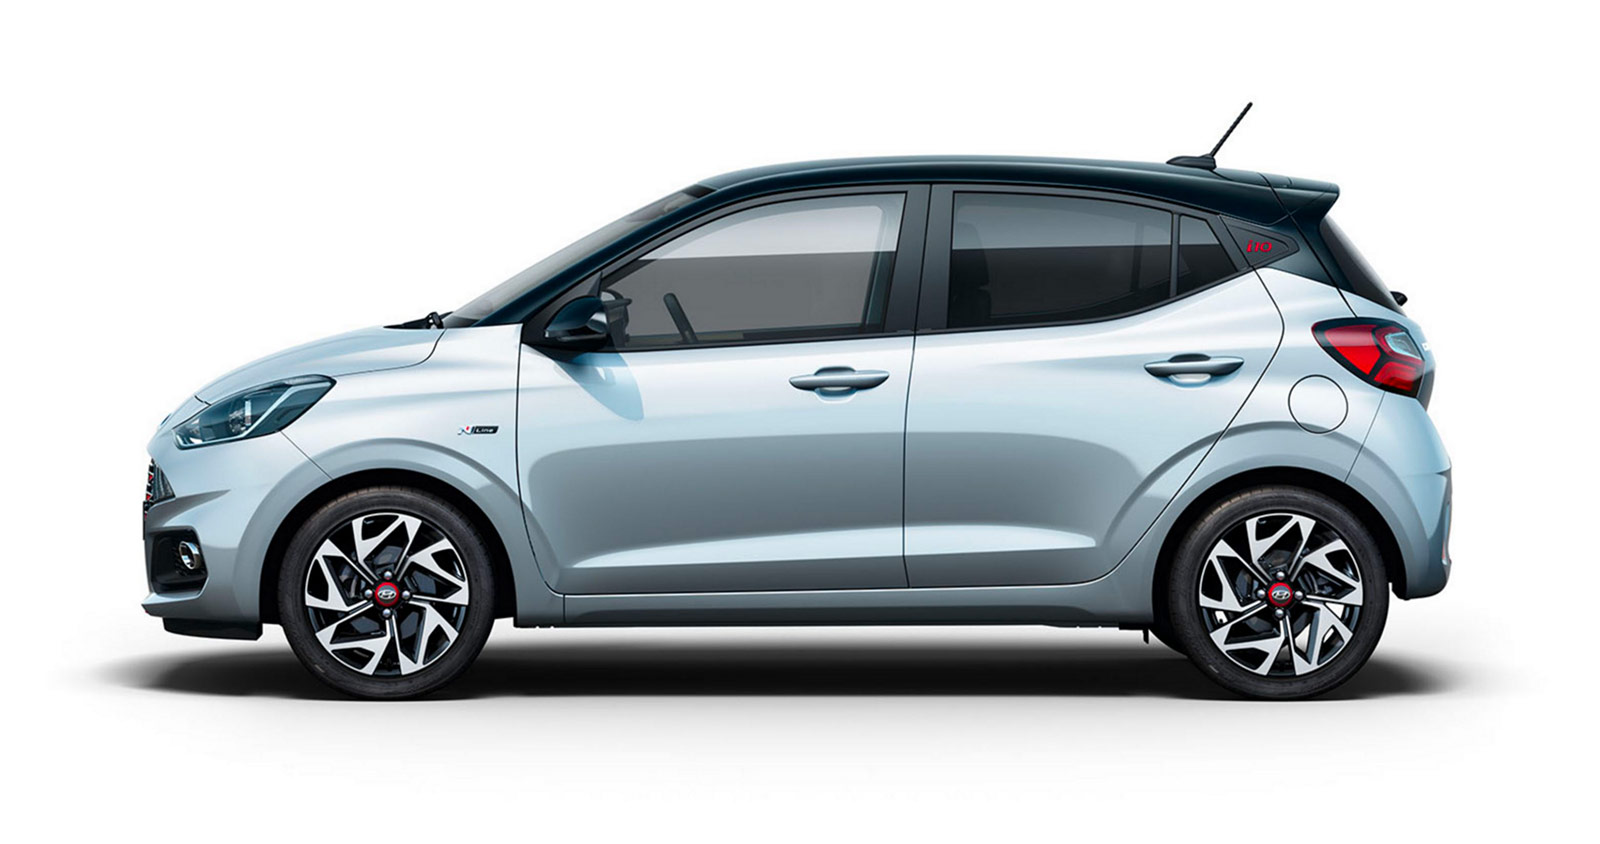 Profil de la Hyundai i10 N Line